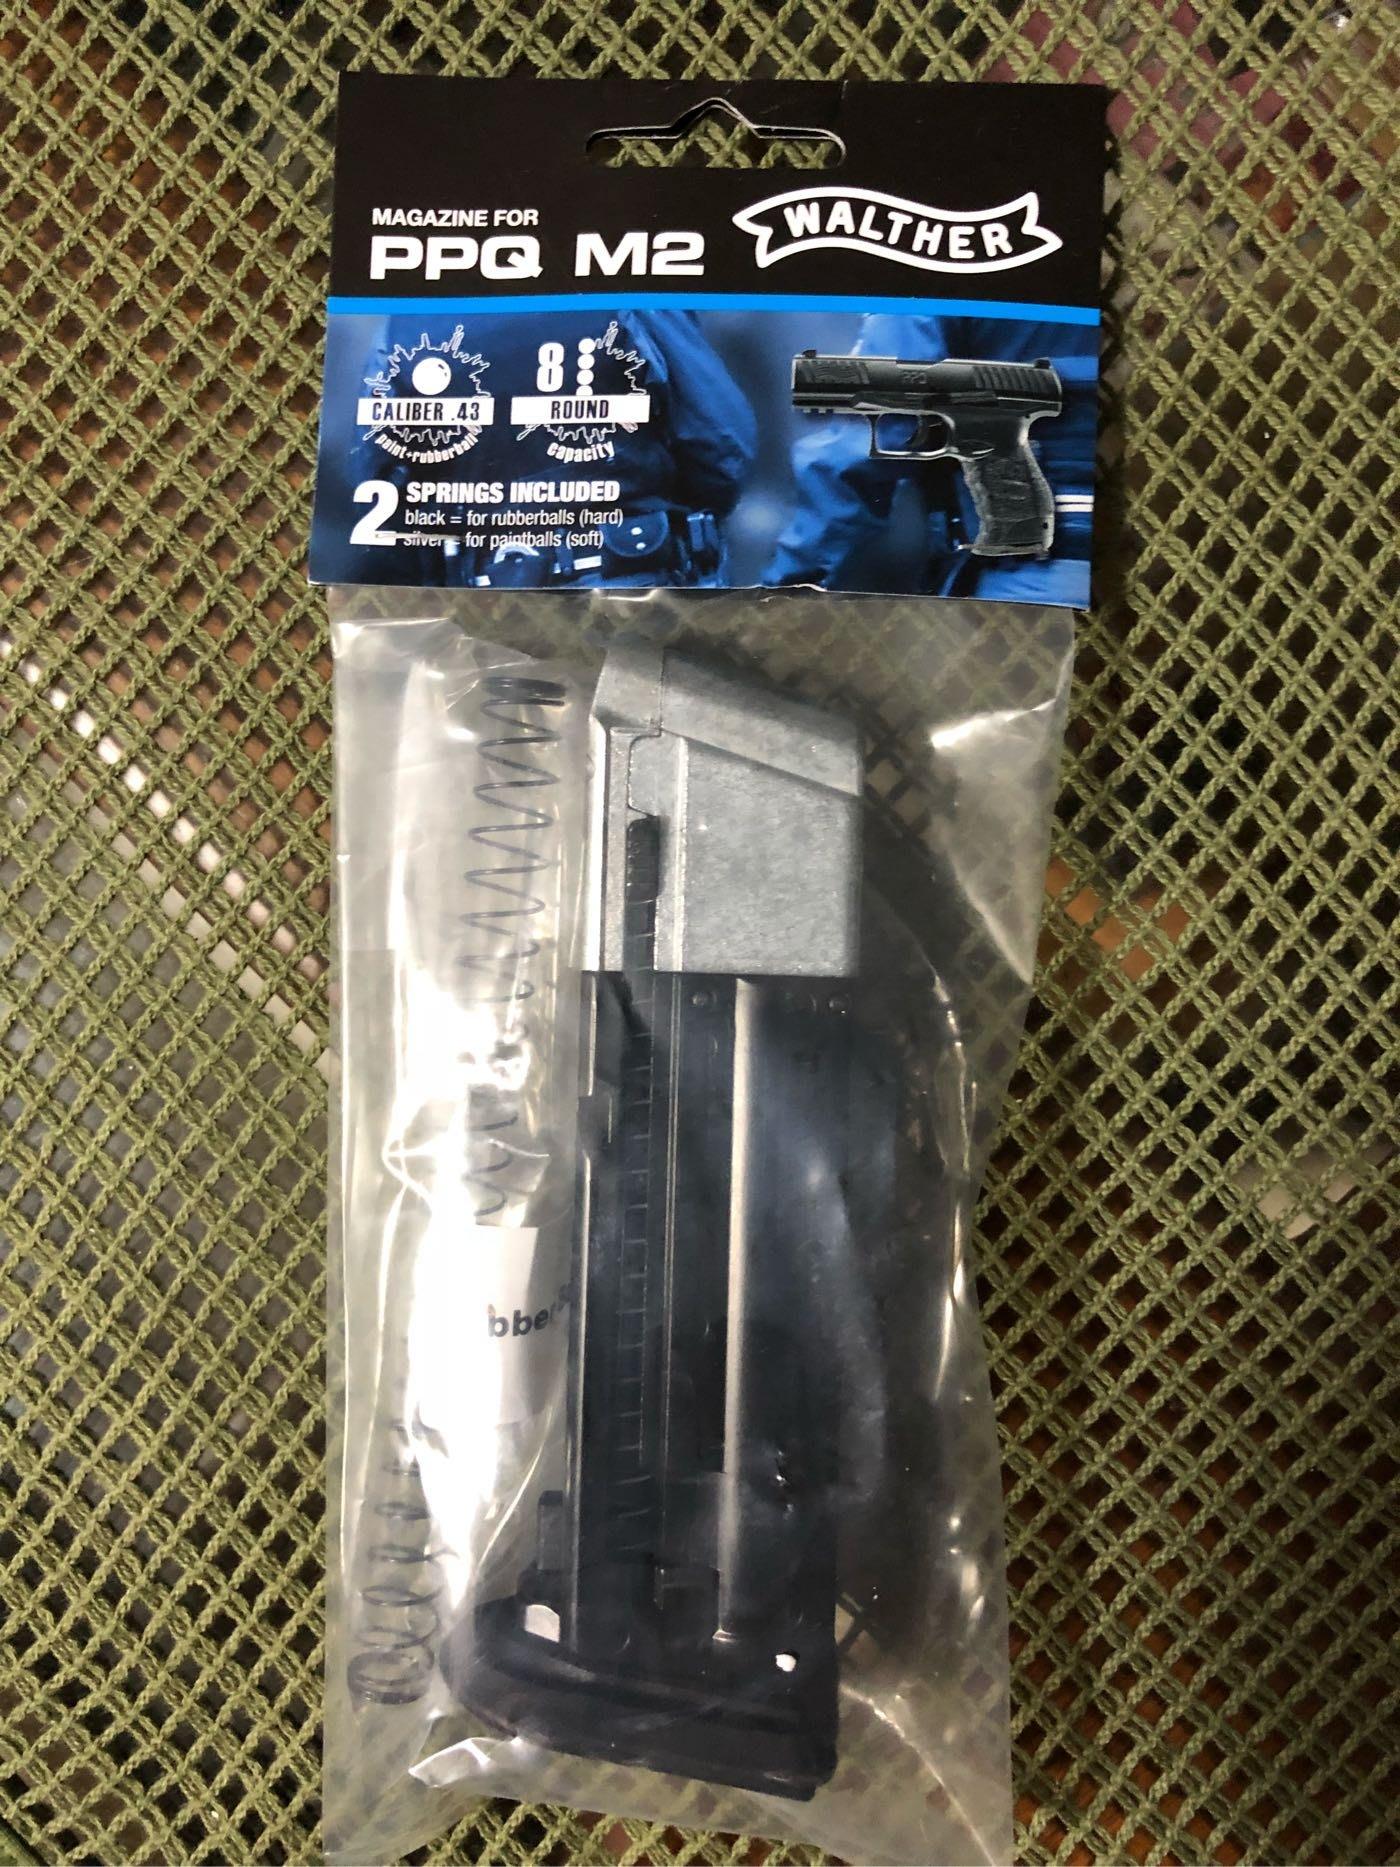 EFA漆彈精品 客製強化版 UMAREX WALTHER 11mm PPQ M2 漆彈鎮暴槍 專用彈匣